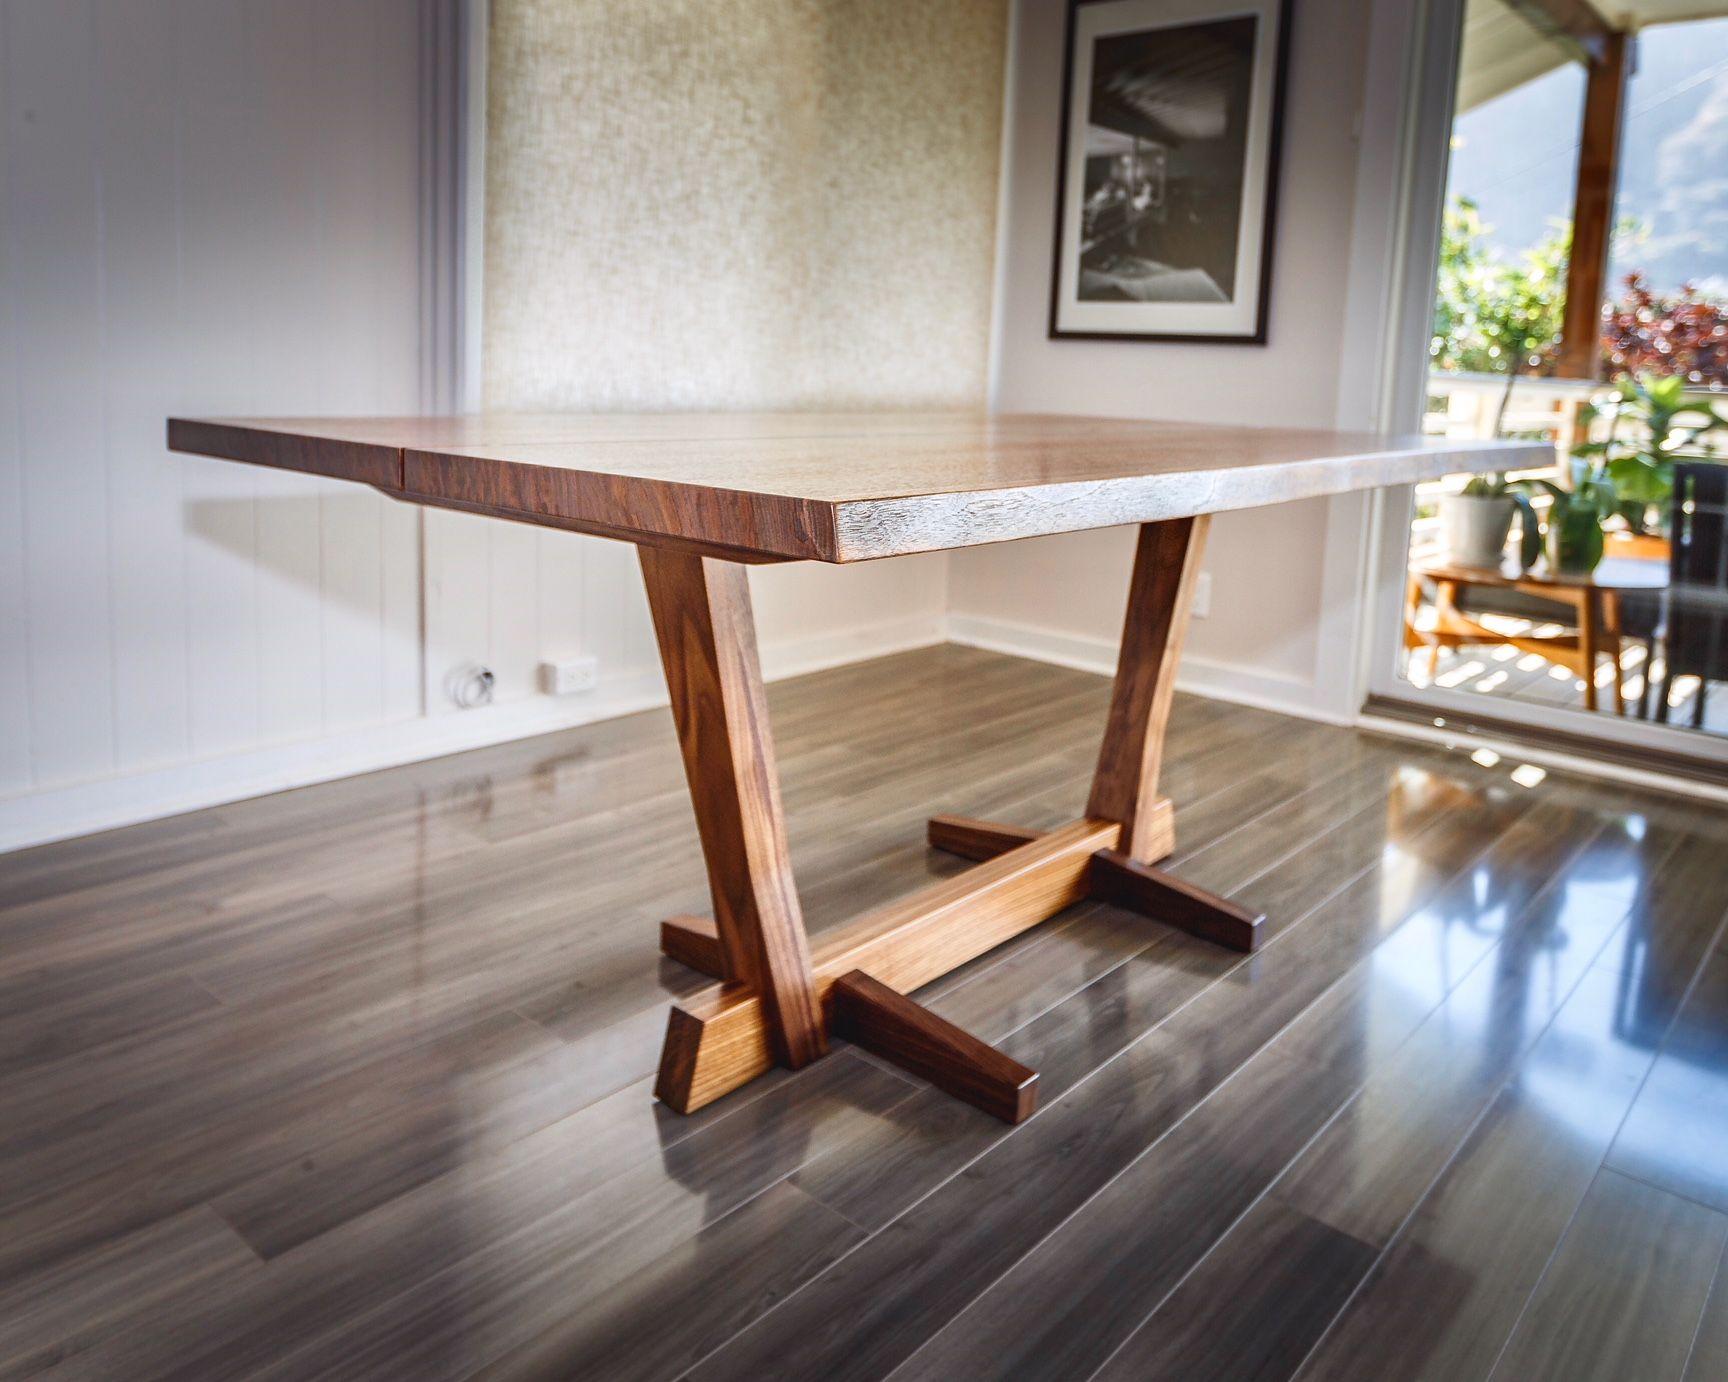 Walntu Slab Dining Table Made By Satoshi Yamauchi Slab Dining